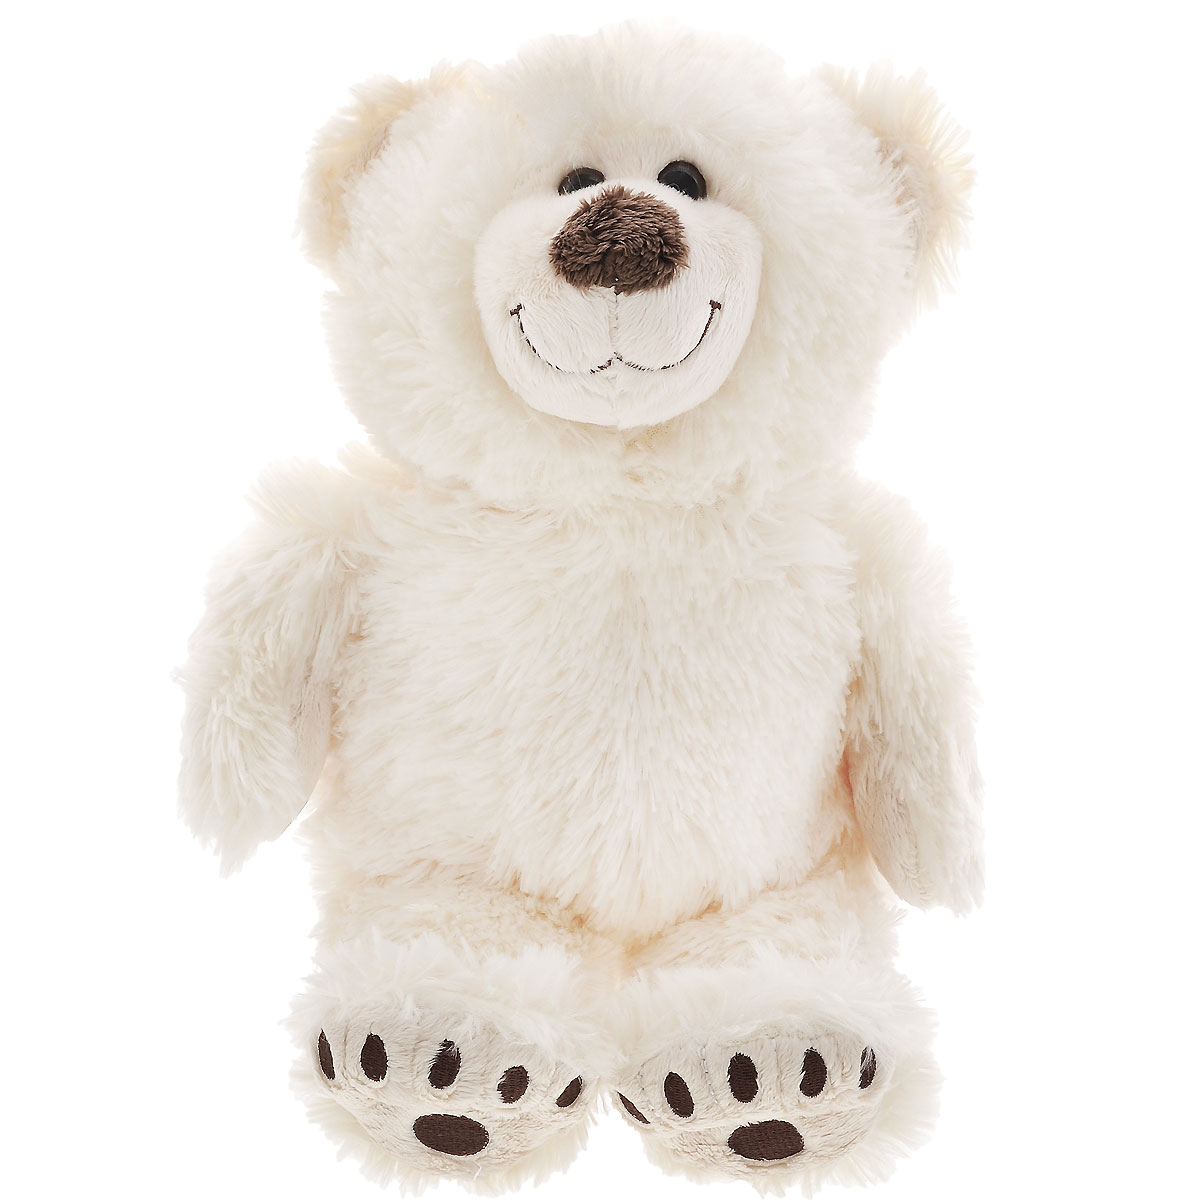 Plush Apple Мягкая игрушка Медведь Аркаша, 44 см мягкая игрушка plush apple собака с шарфом 28 см